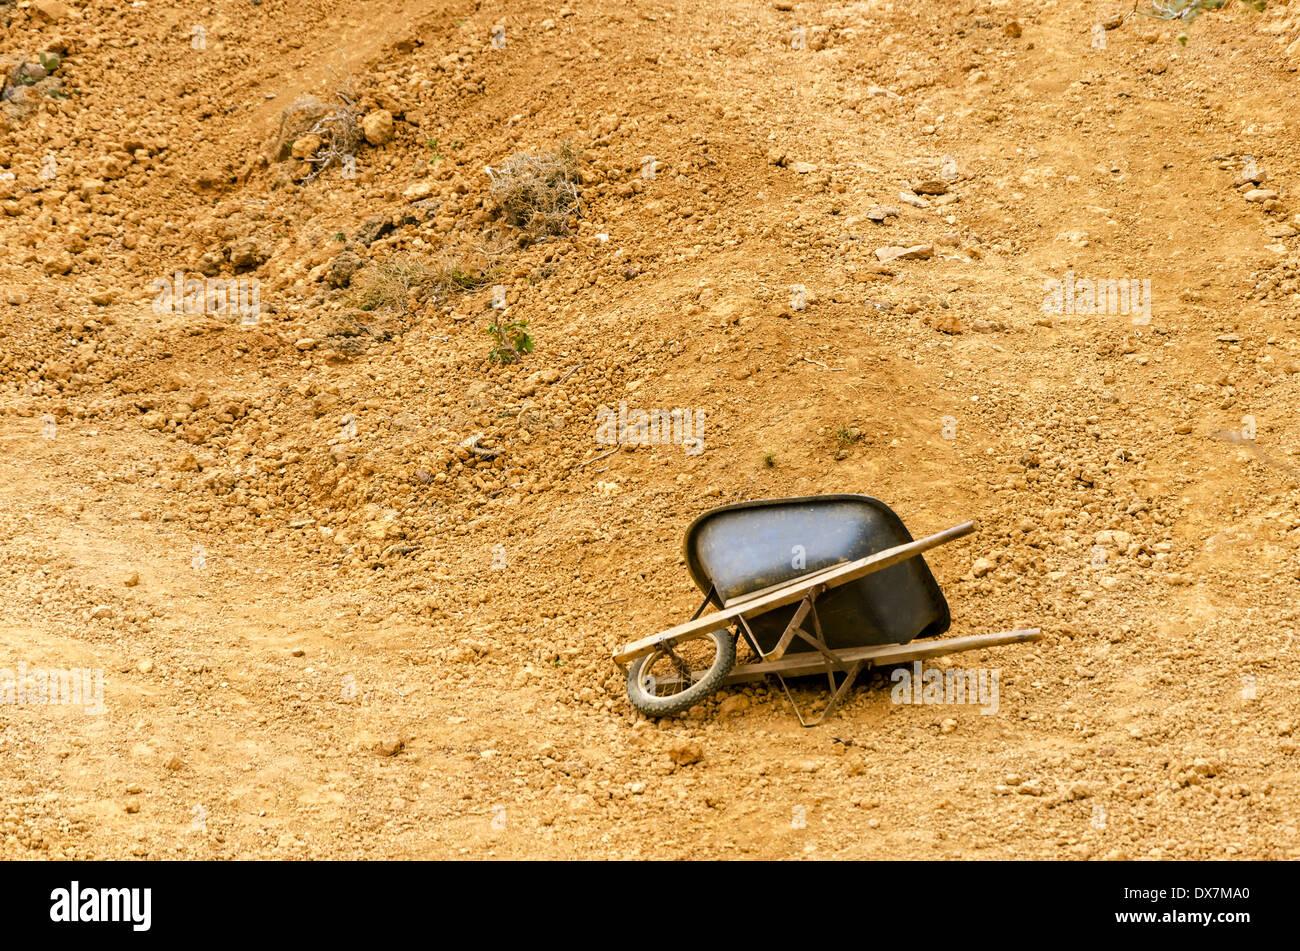 Black wheelbarrow in a dry barren setting - Stock Image